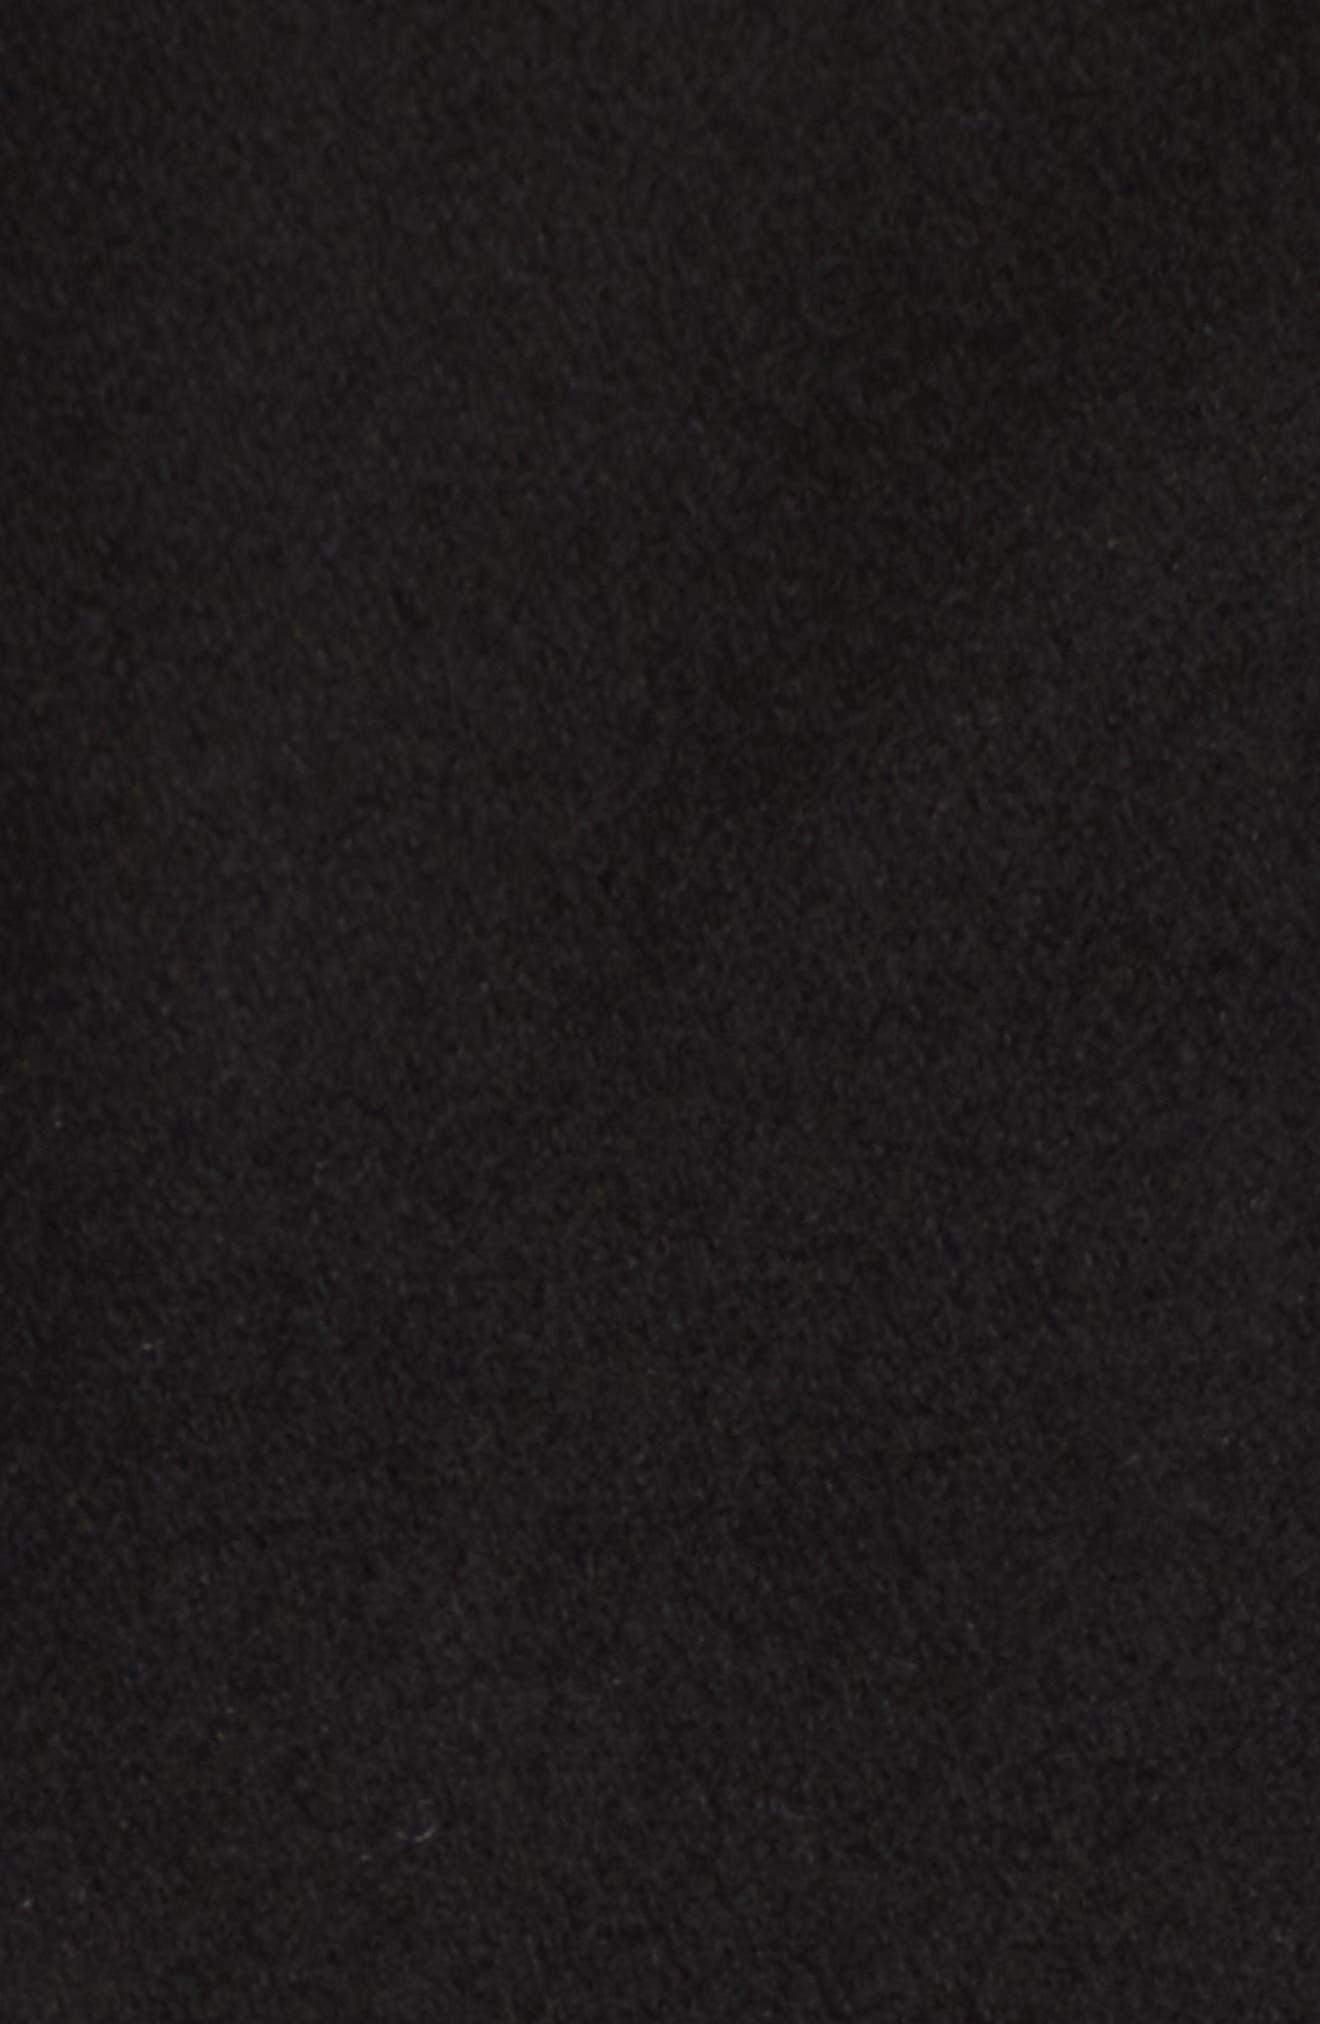 Wrap Trench Coat,                             Alternate thumbnail 5, color,                             Black